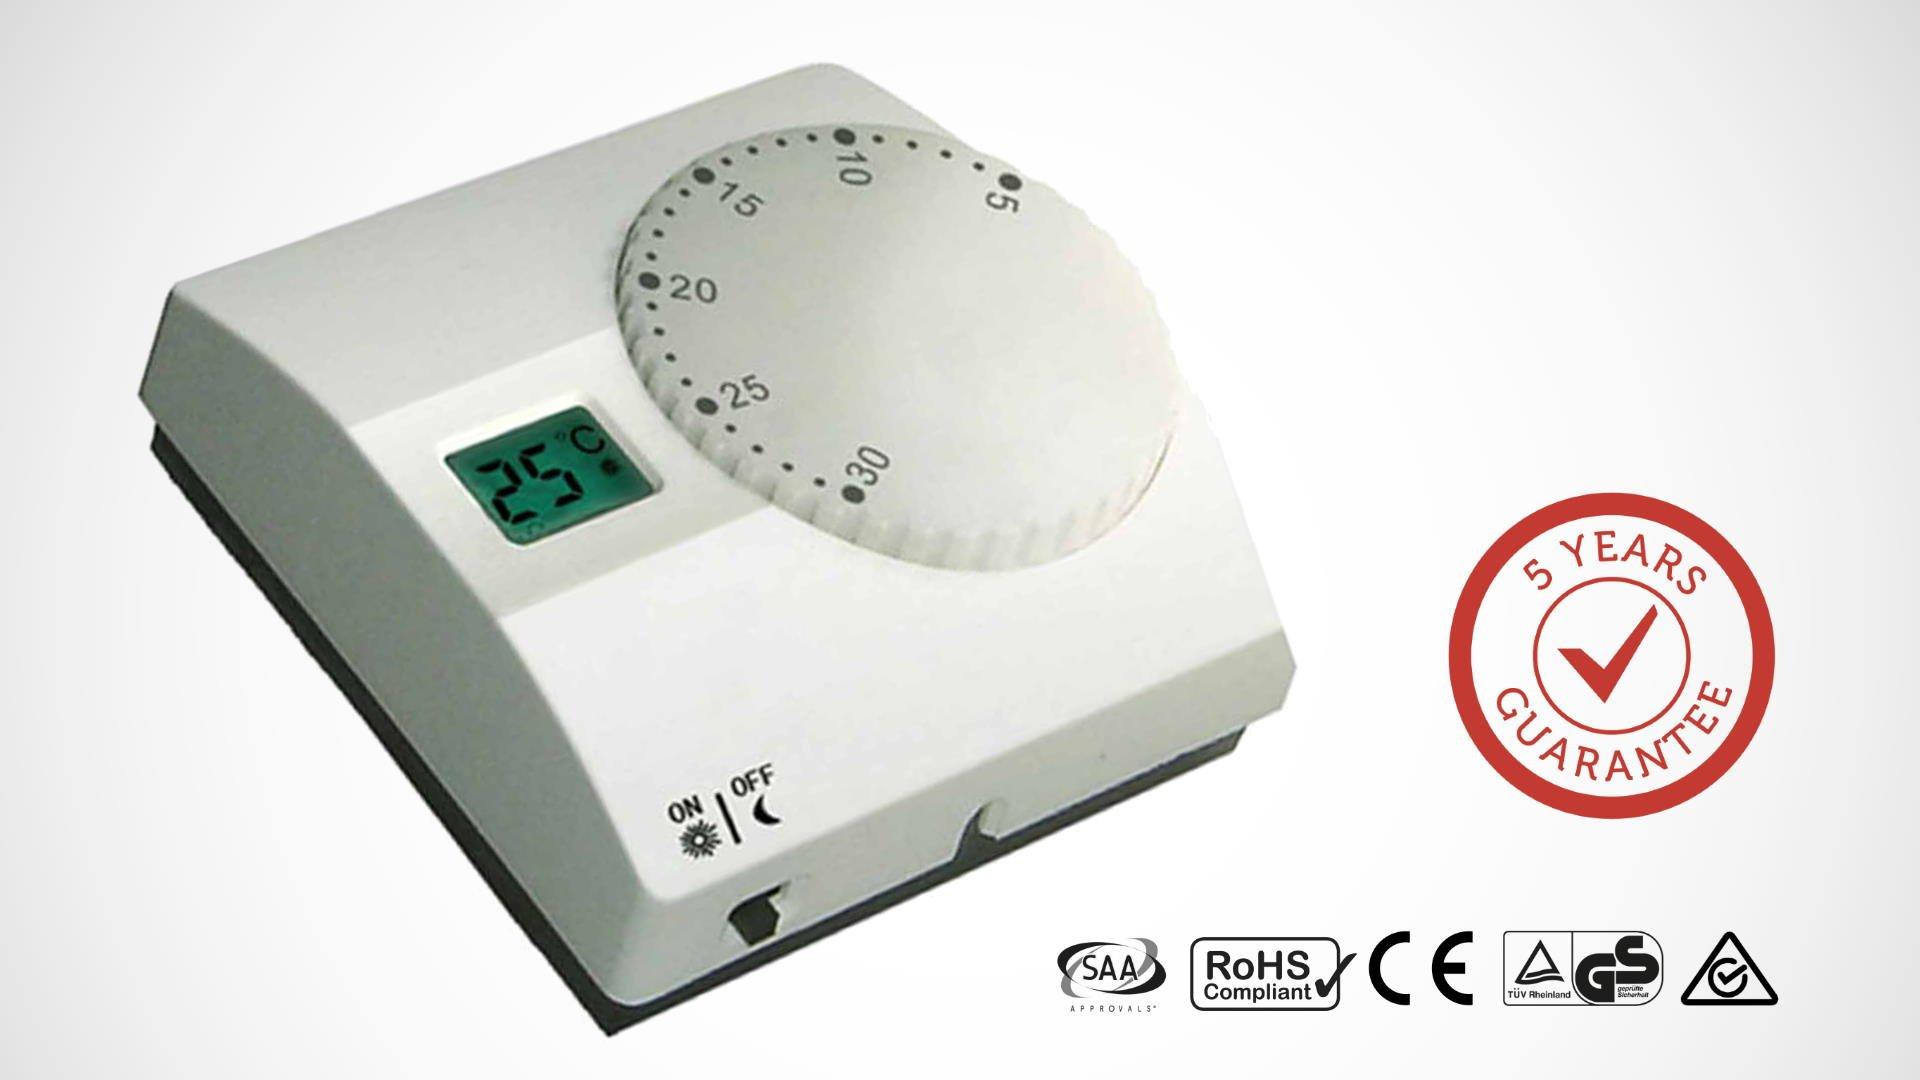 HMT4991 manual thermostat